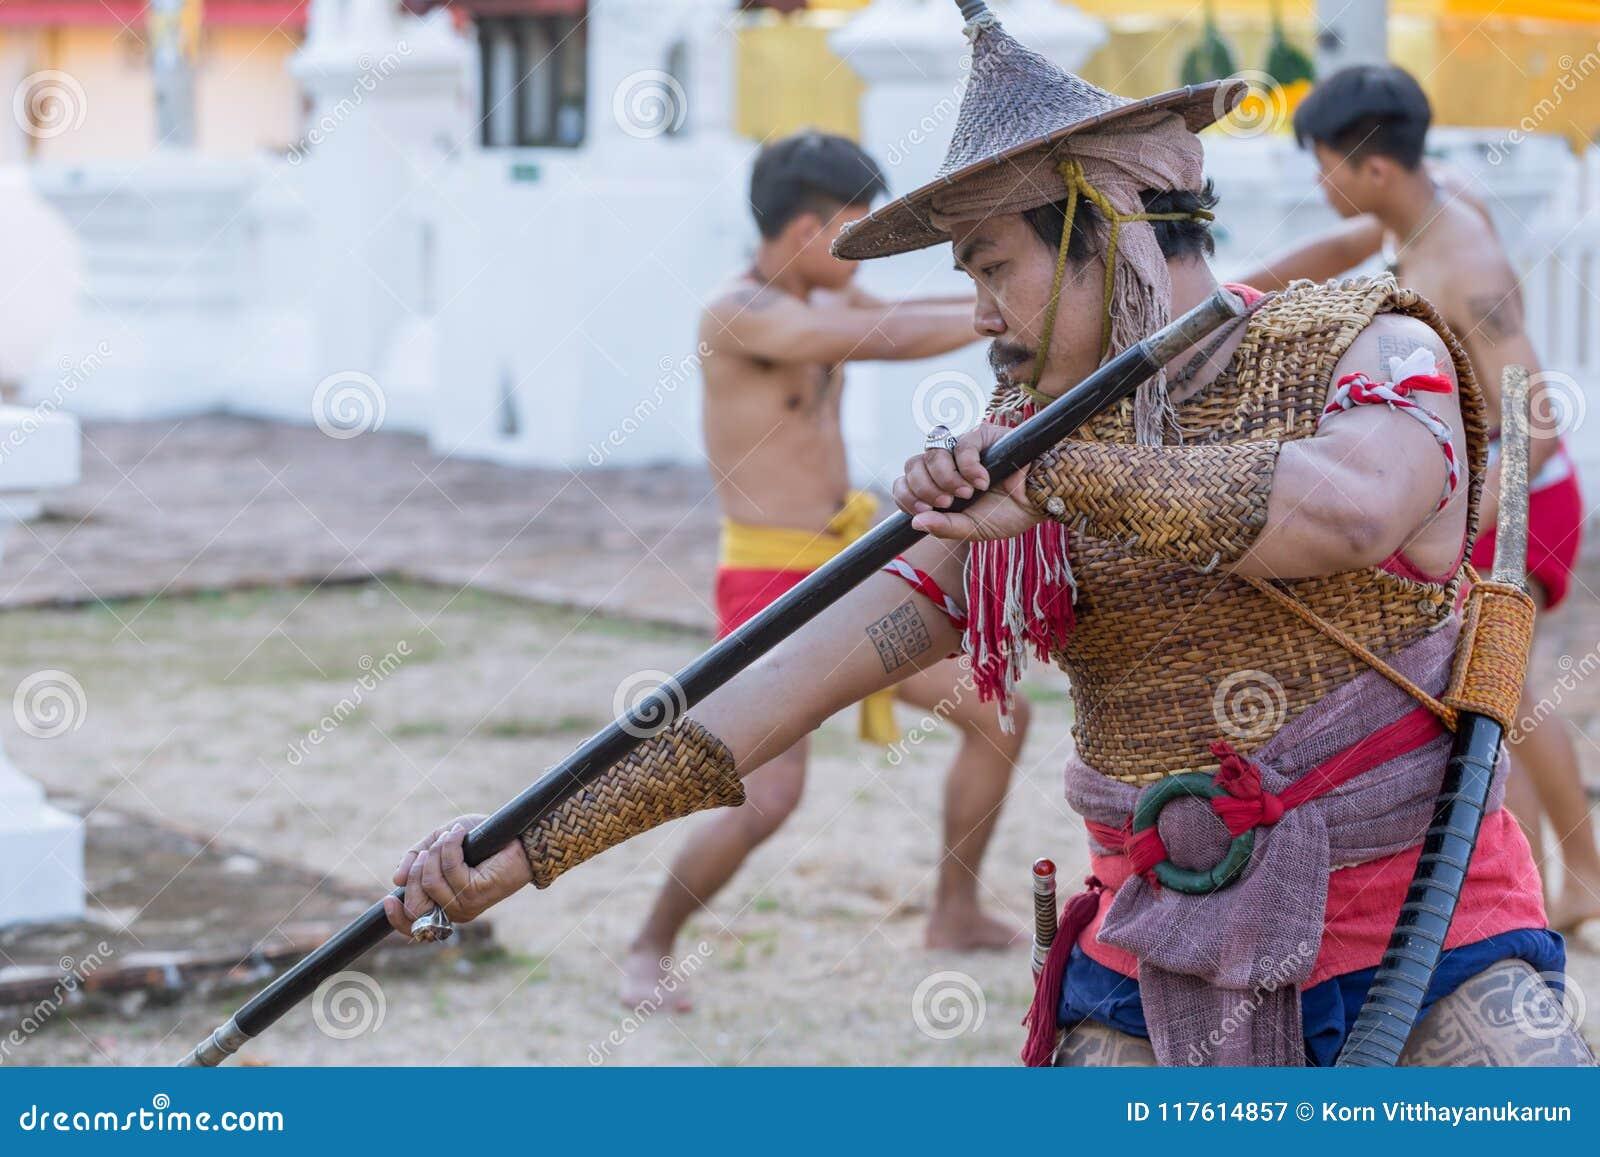 Thai Ancient Warrior Swordsmanship Fighting Action With